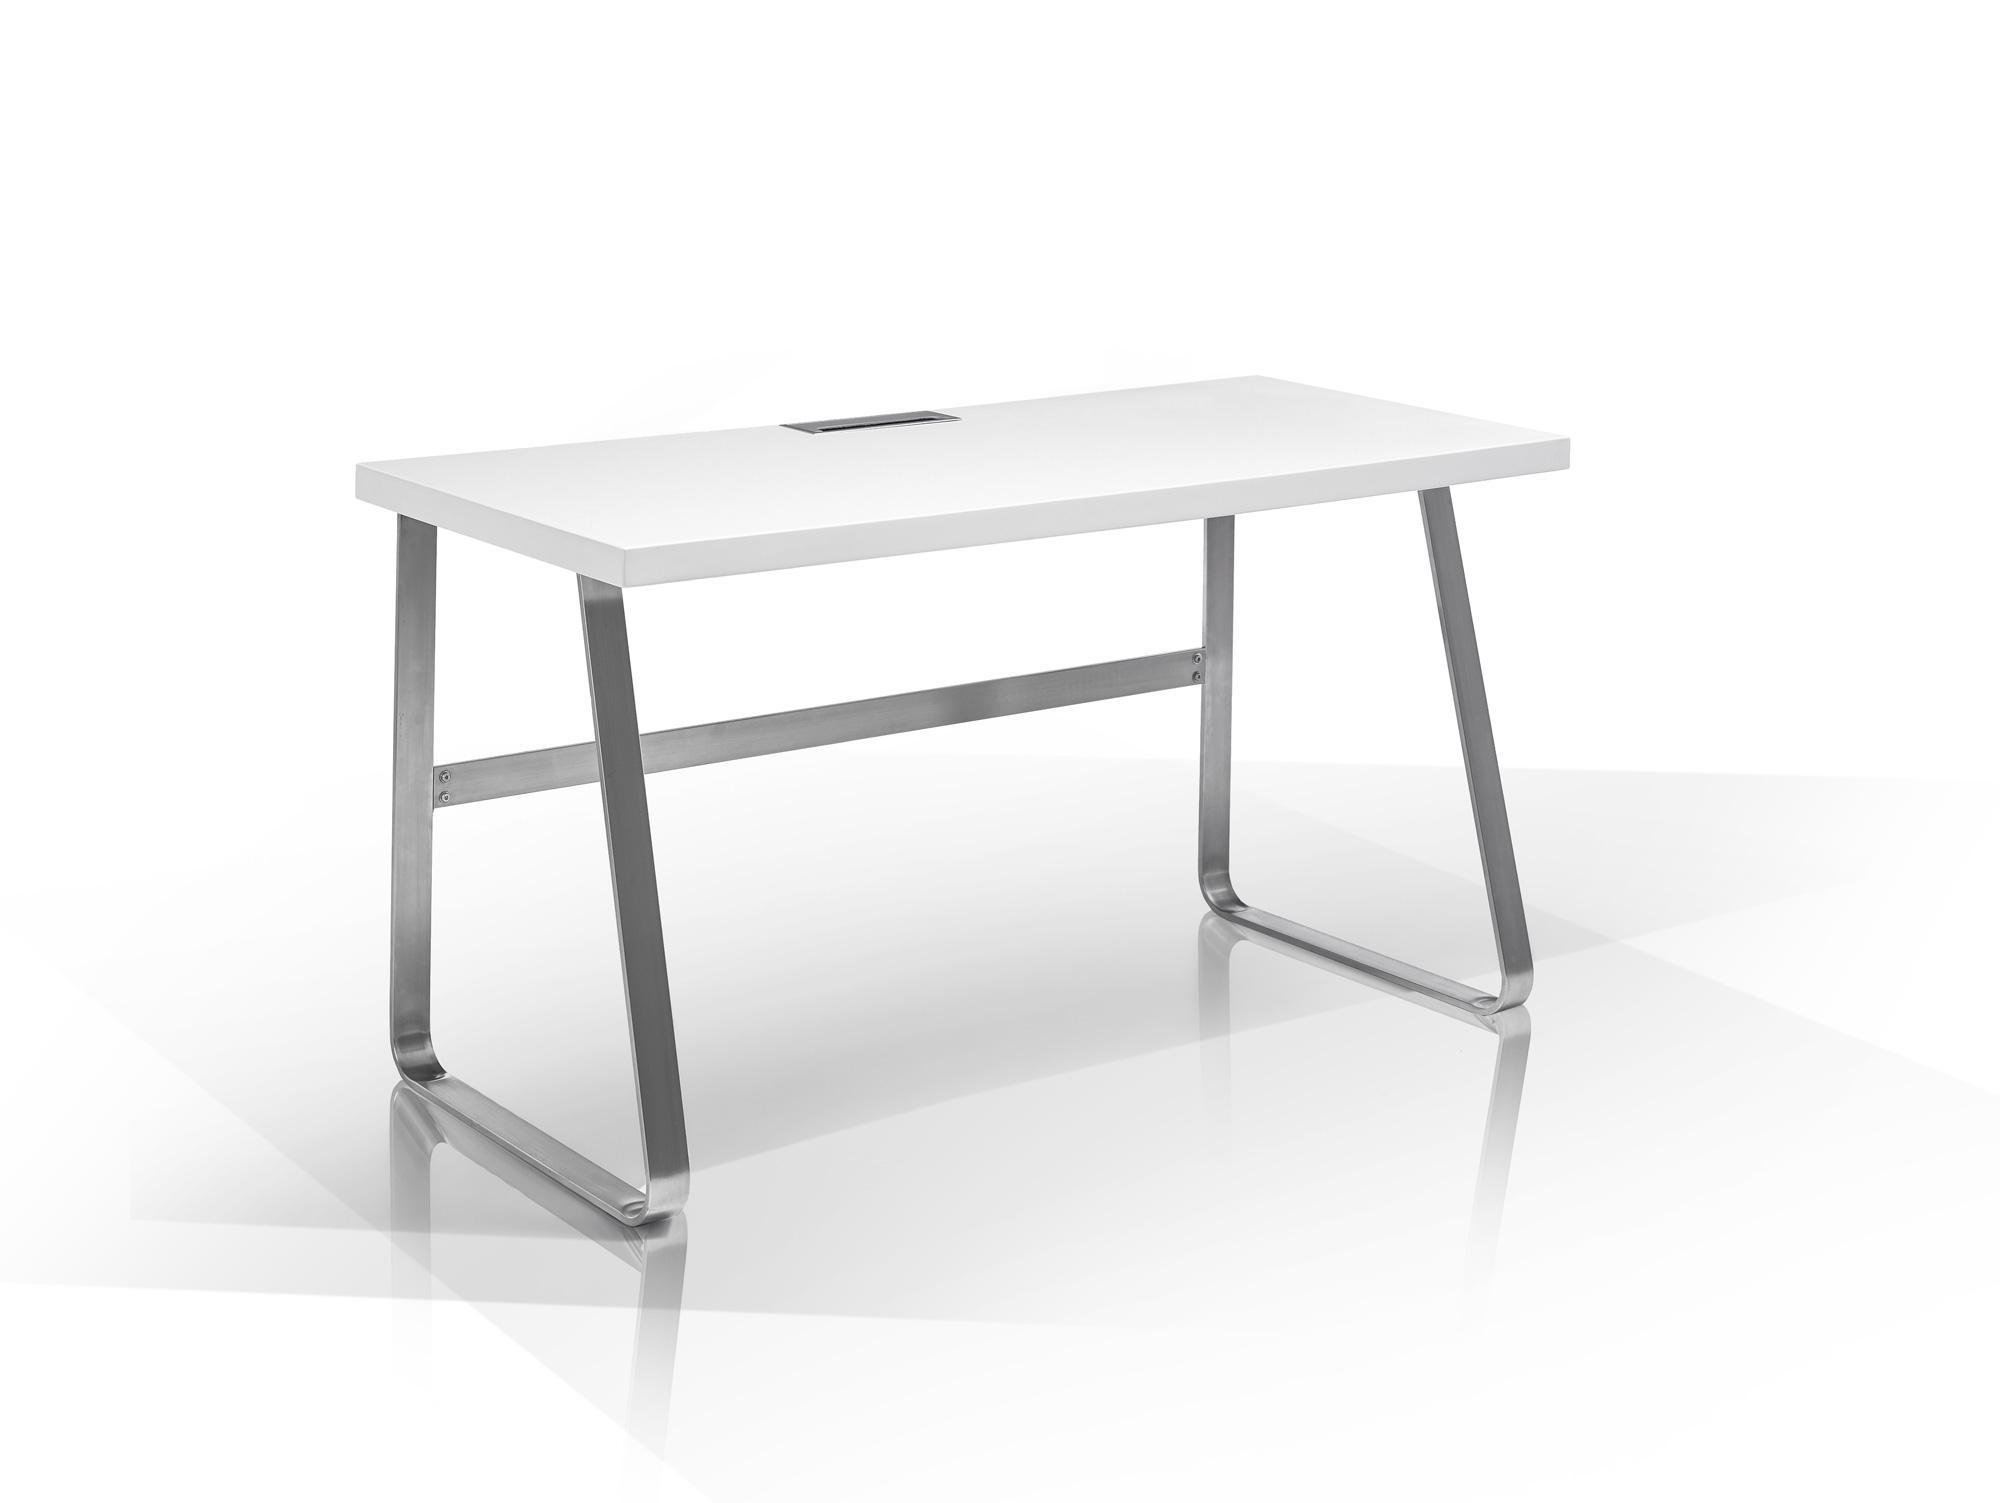 bailey ii schreibtisch matt wei. Black Bedroom Furniture Sets. Home Design Ideas